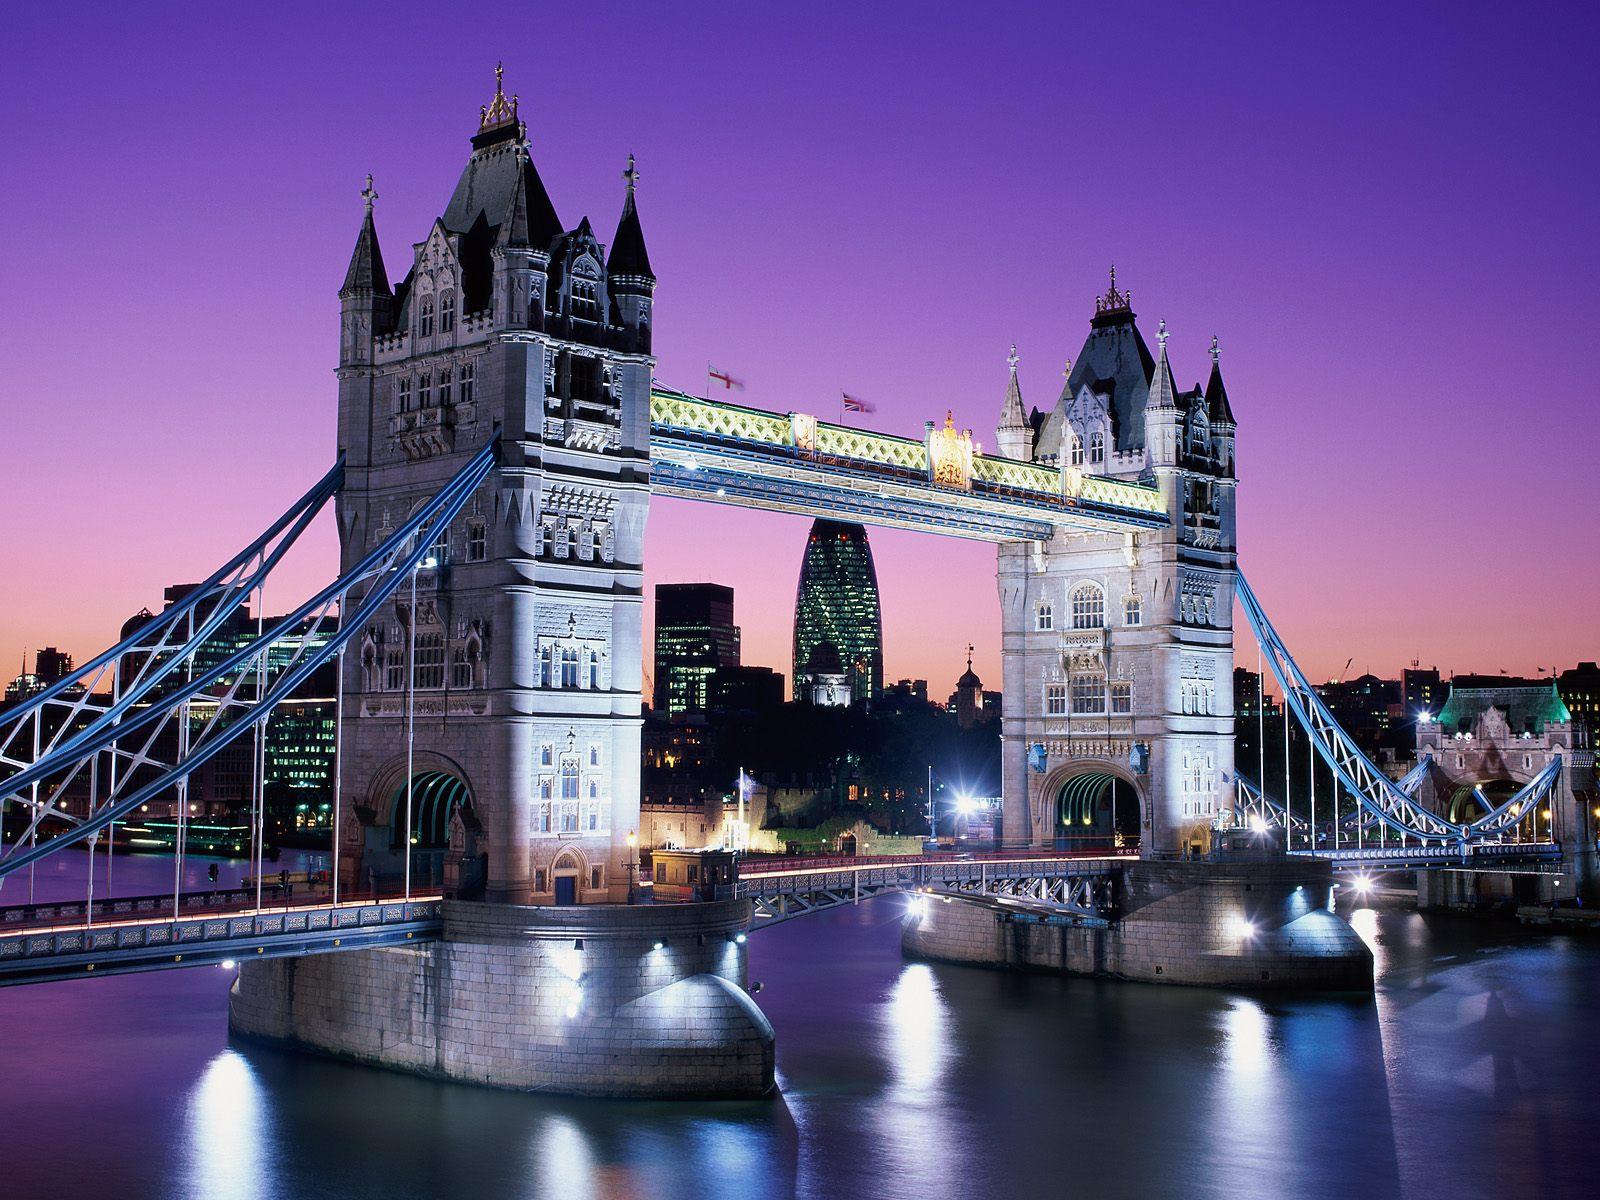 London, England - Great Britain Wallpaper (31748890) - Fanpop